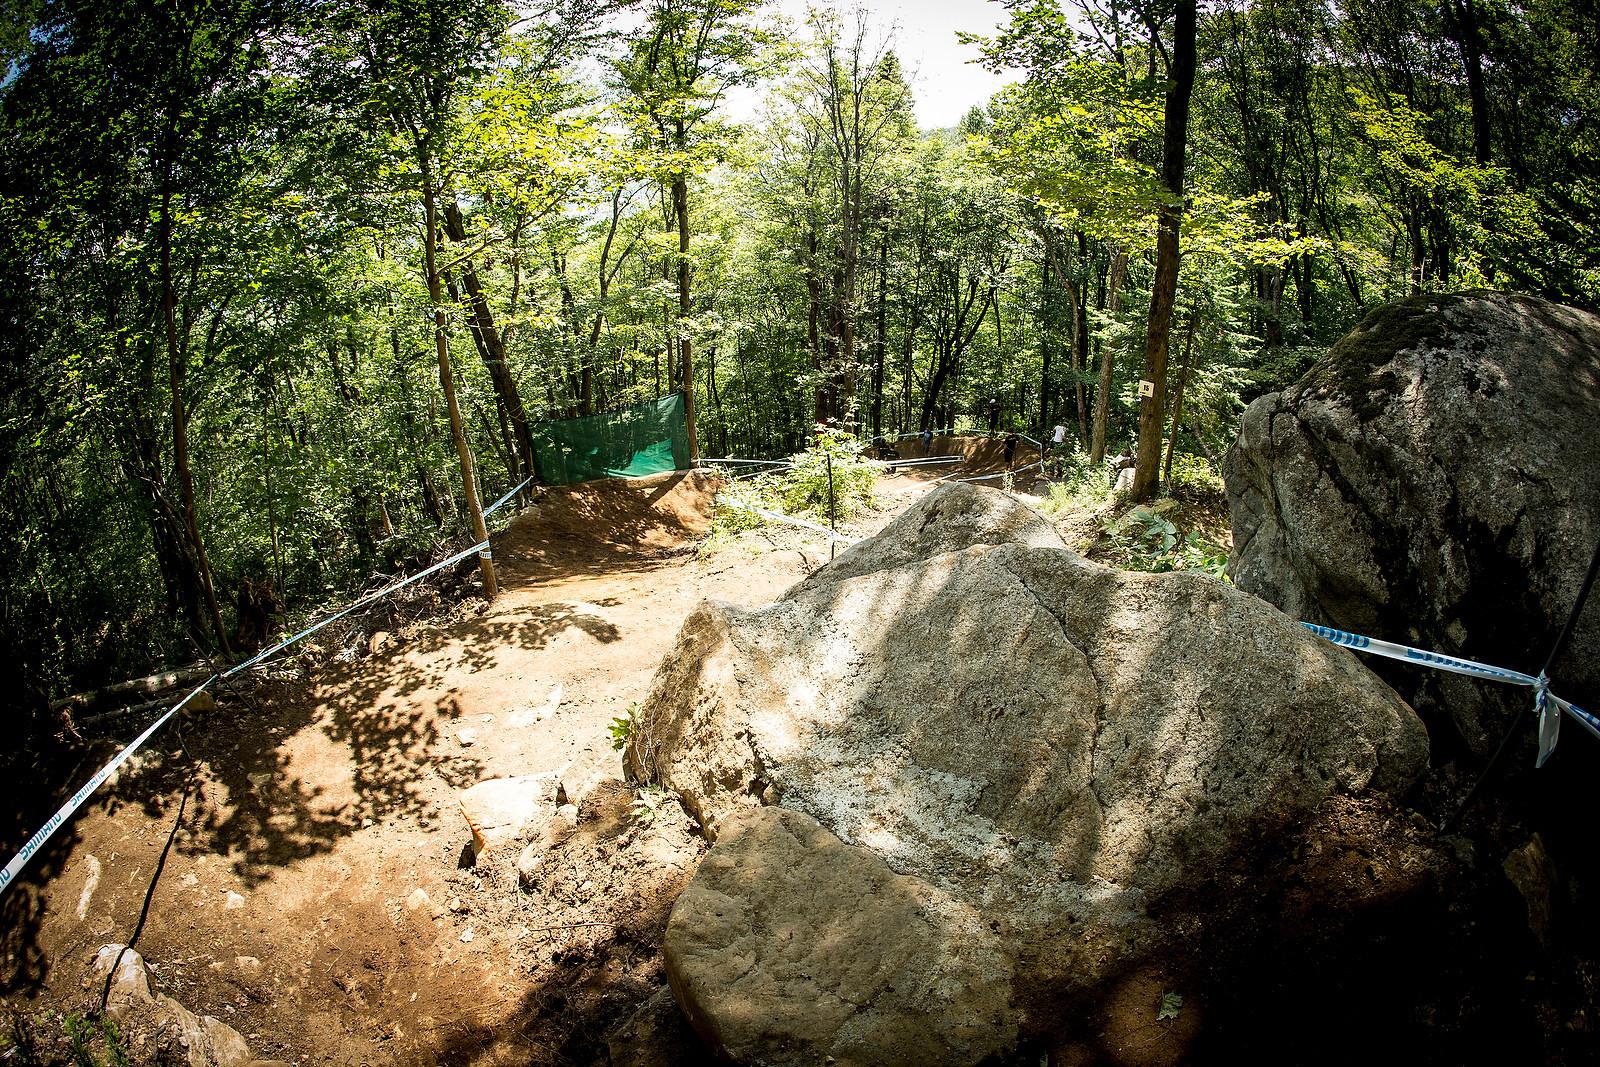 Mont Sainte Anne Steeps - PIT BITS, Track Walk - It's On at Mont Sainte Anne World Cup - Mountain Biking Pictures - Vital MTB